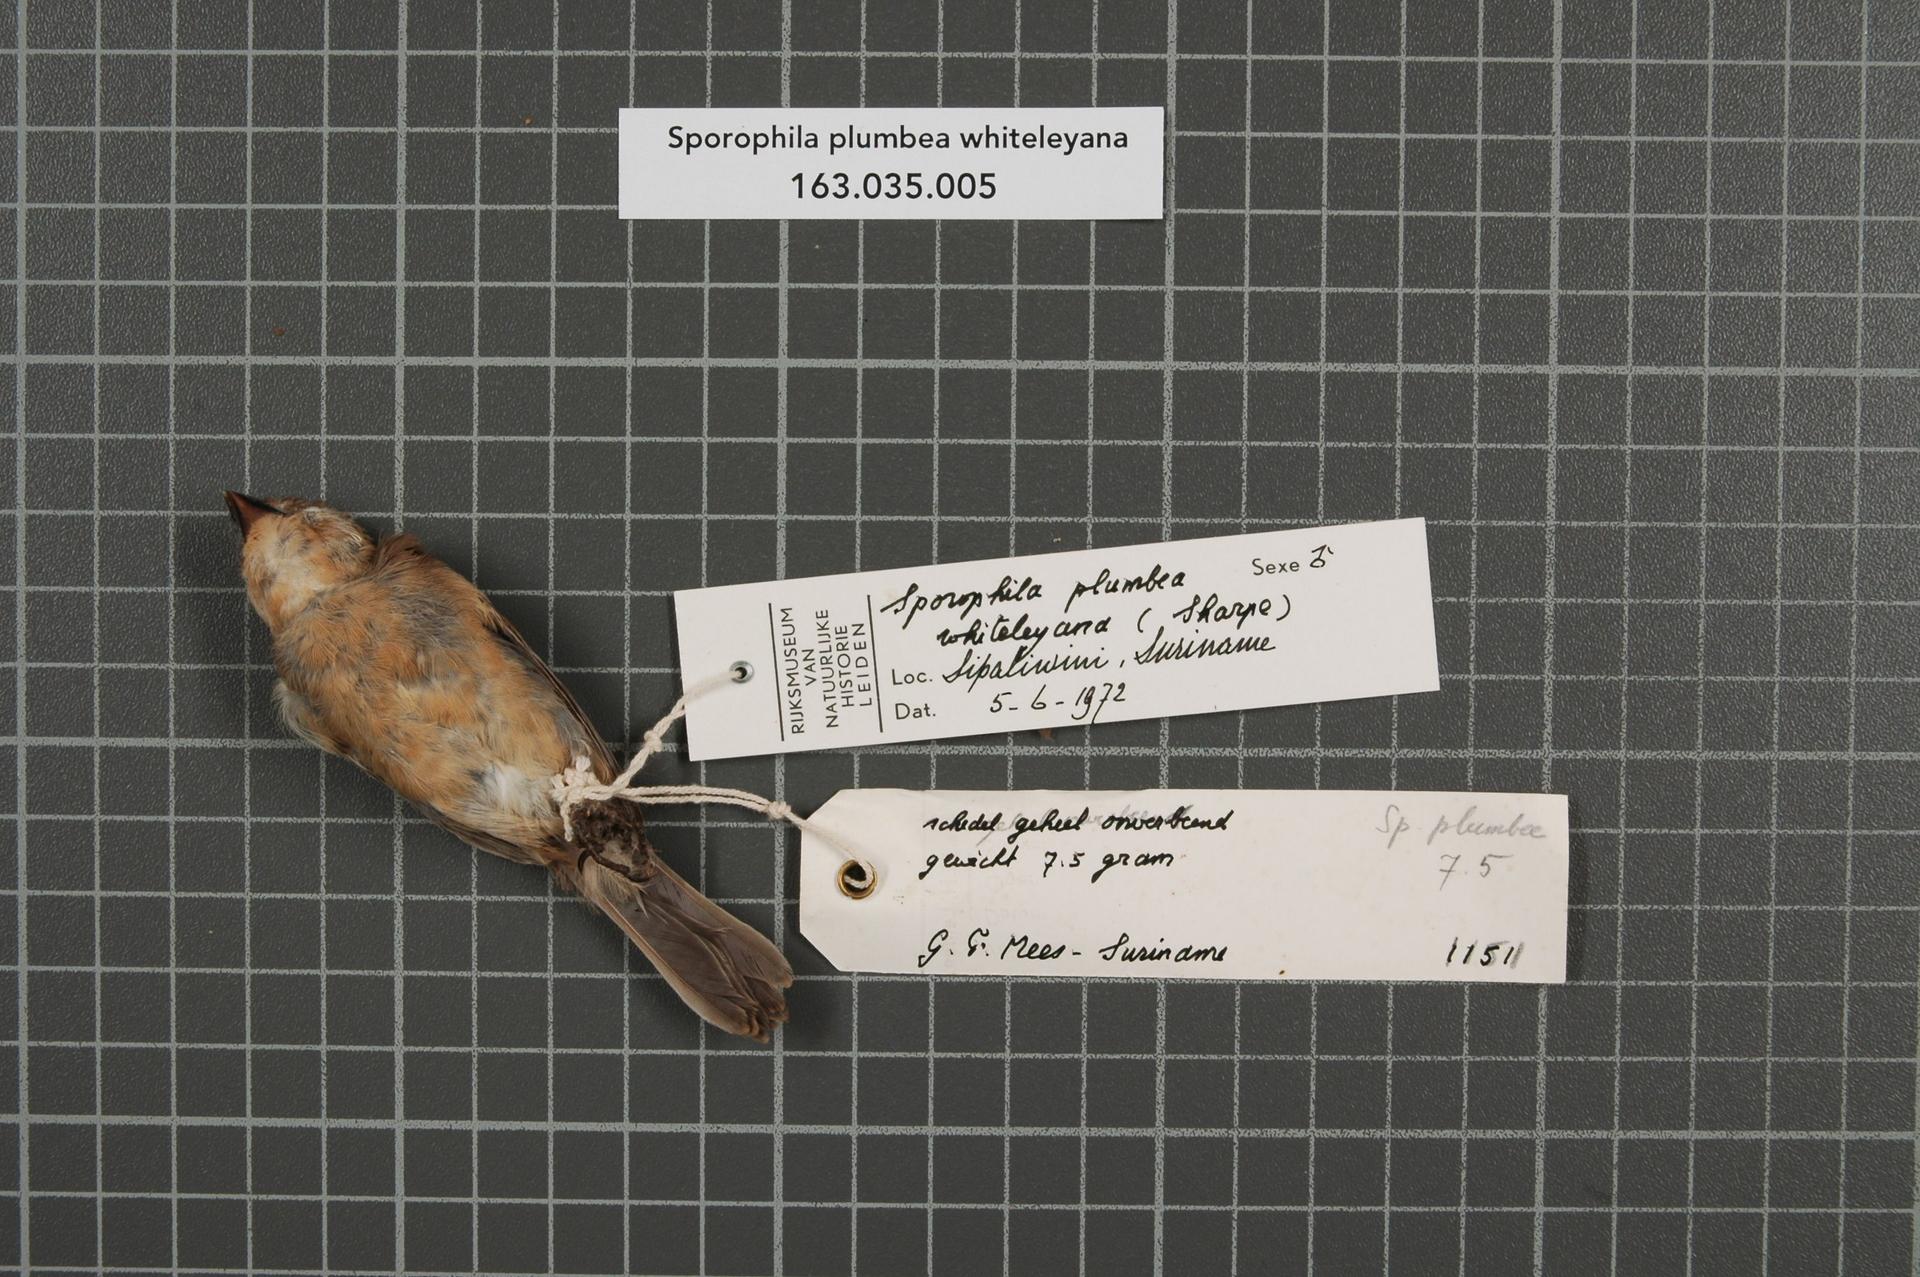 RMNH.AVES.72670   Sporophila plumbea whiteleyana (Sharpe, 1888)